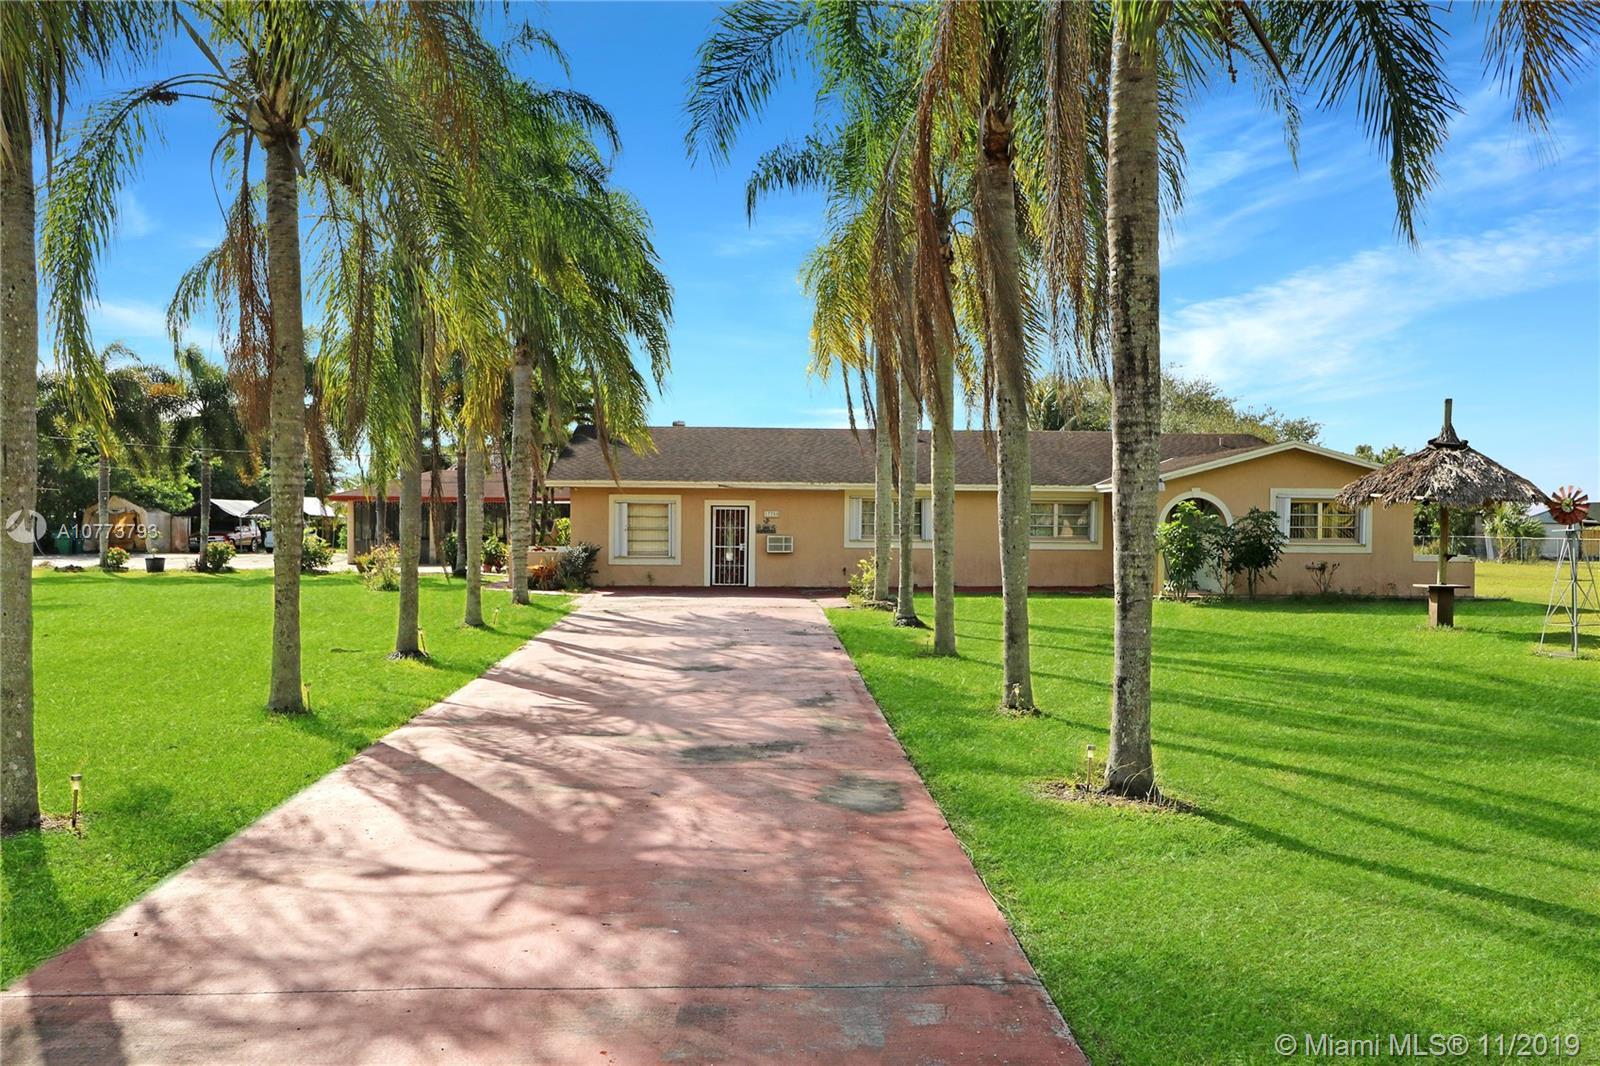 17750 SW 272nd St, Homestead, FL 33031 - Homestead, FL real estate listing